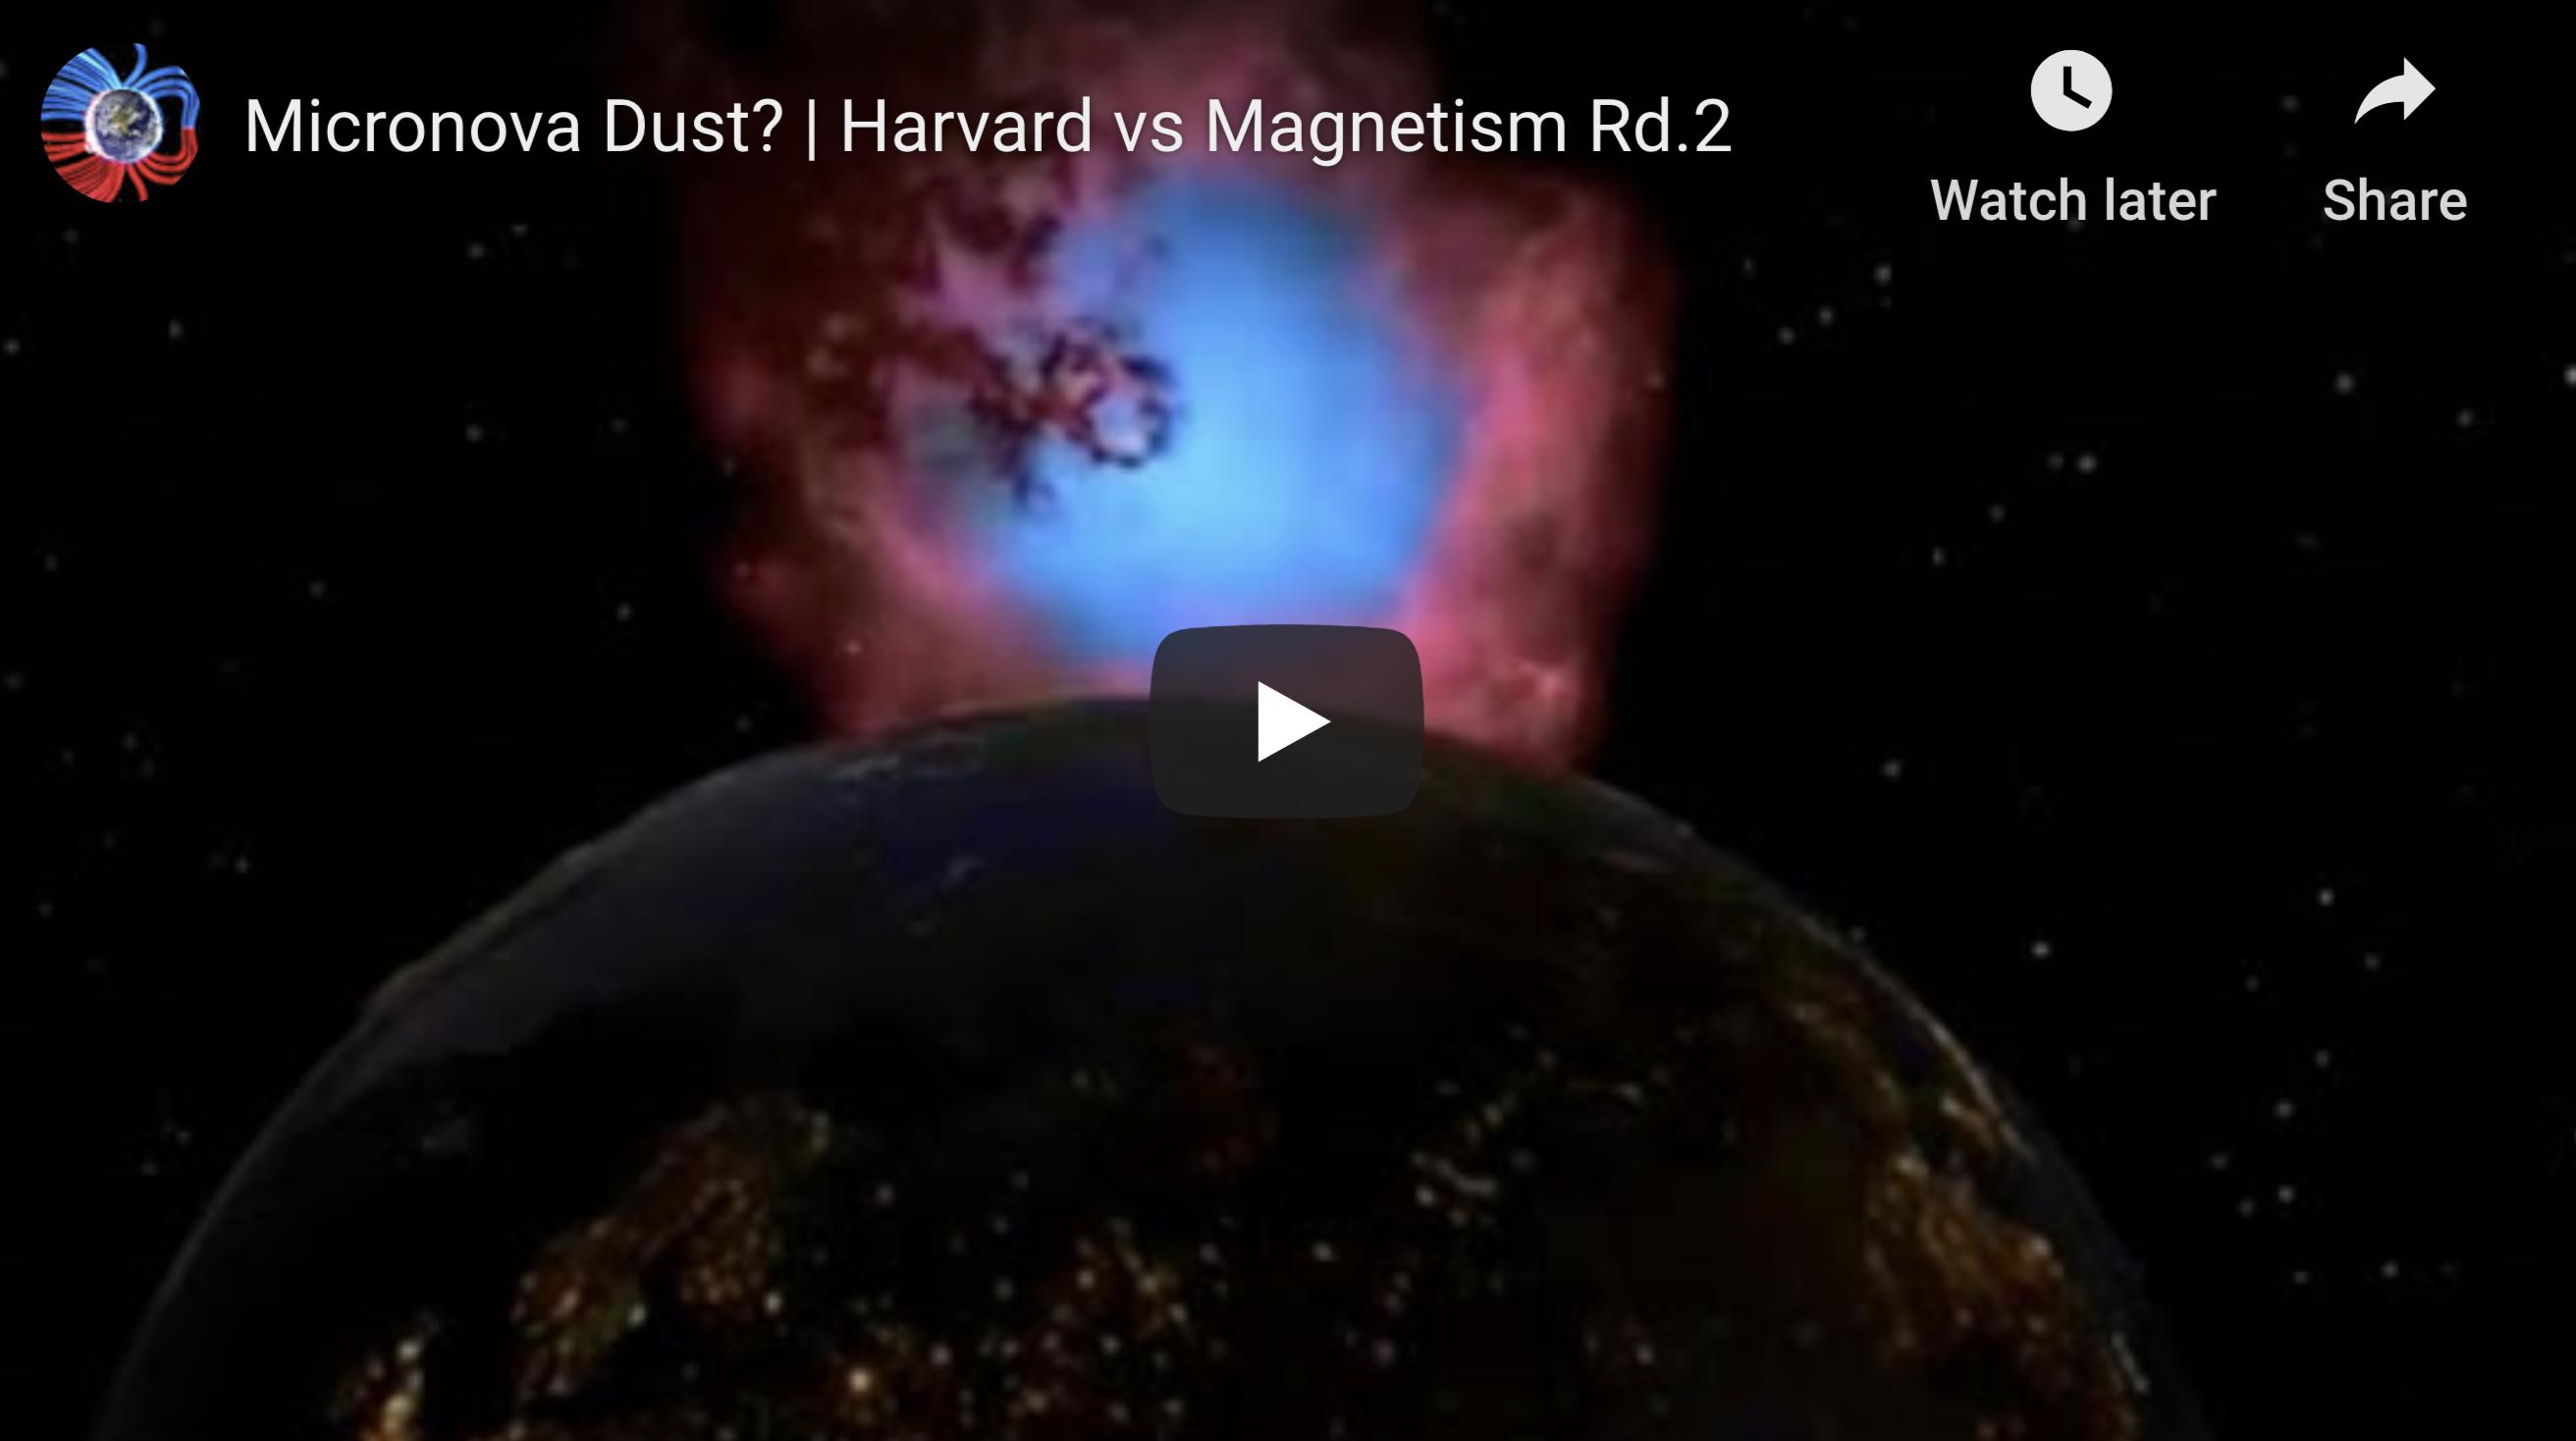 Micronova Dust Harvard vs Magnetism Rd2 EXZM Suspicious Observers post July 15th 2020